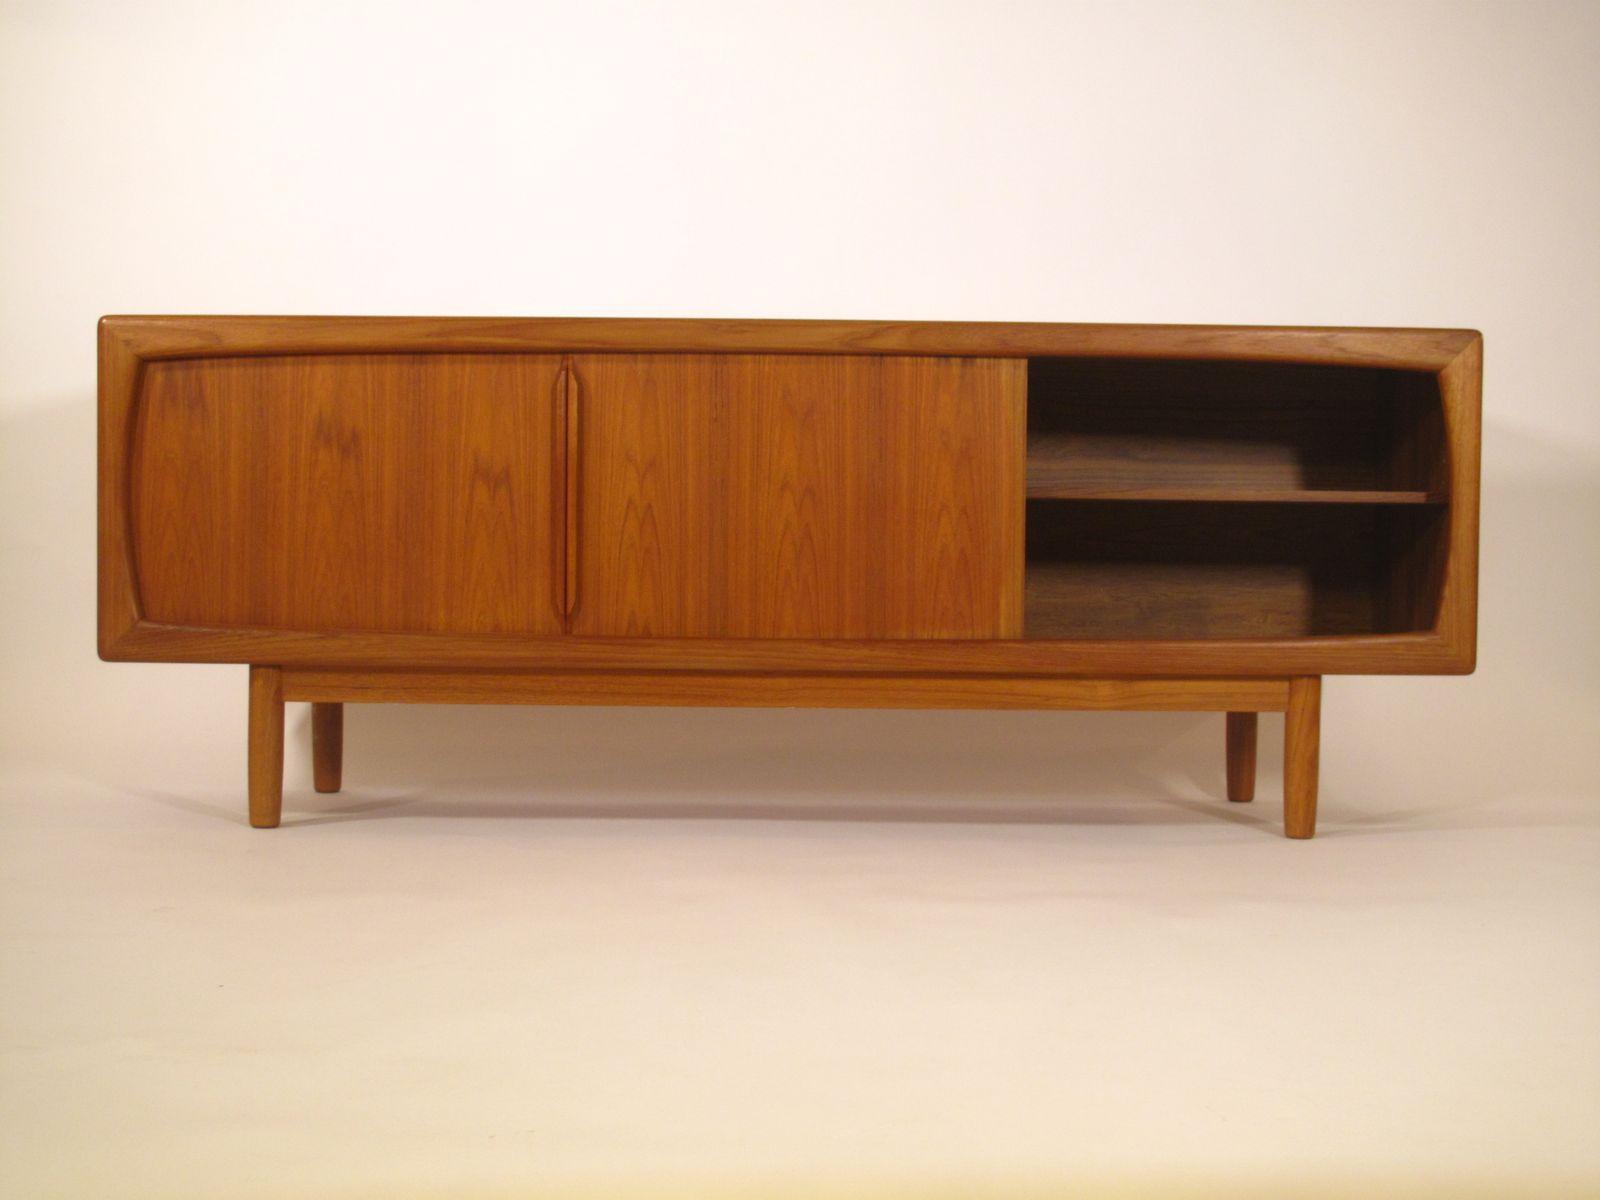 mid century danish teak sideboard for sale at pamono. Black Bedroom Furniture Sets. Home Design Ideas